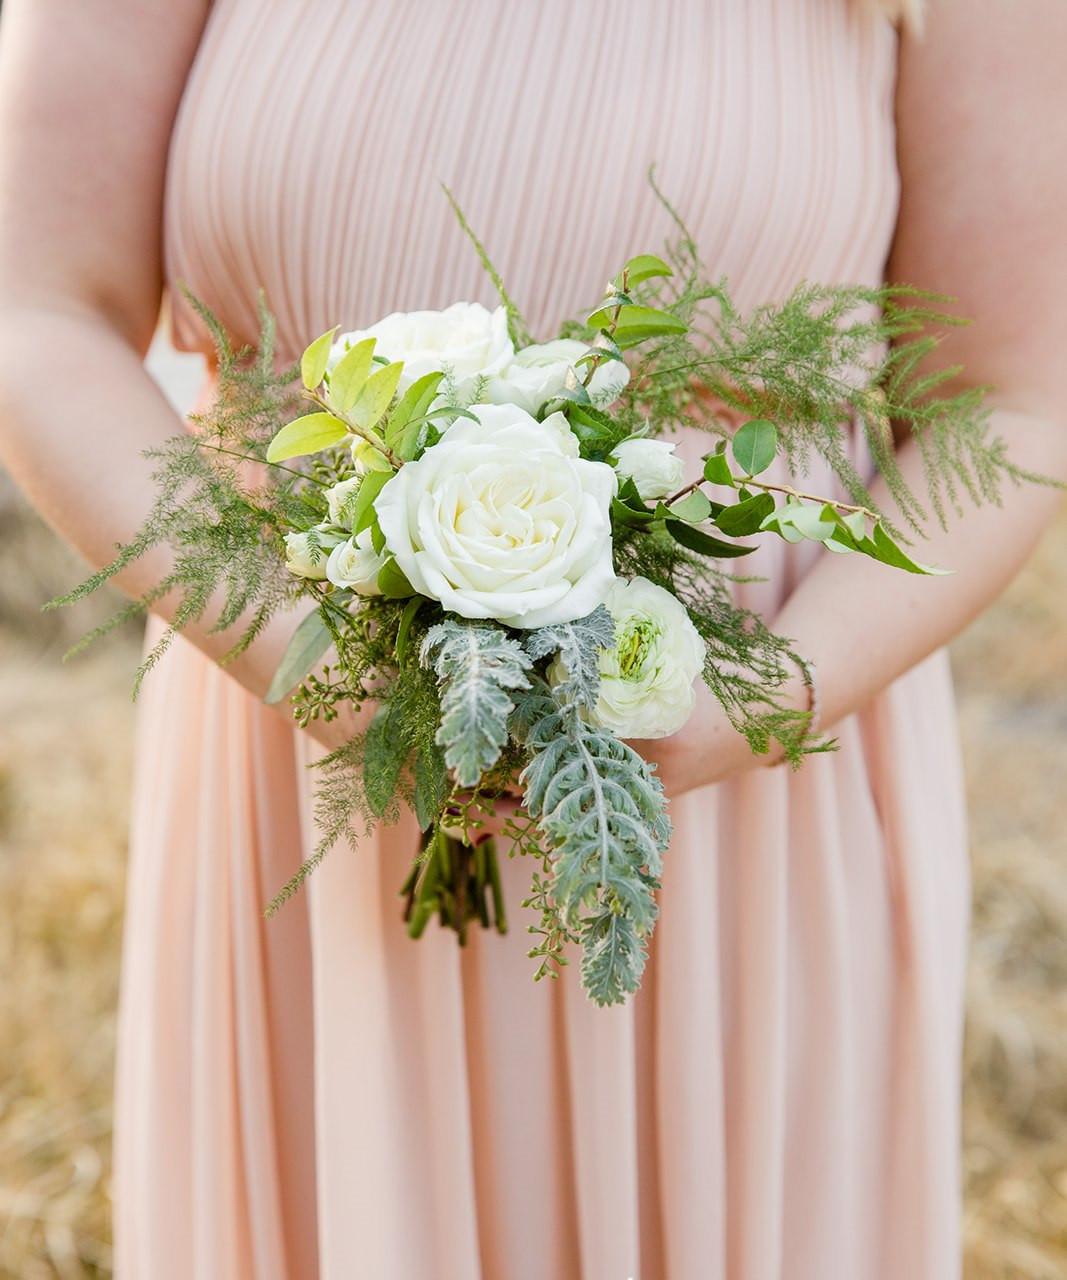 A-Floral-Affair-White-Foliage-Bouquet-Ha